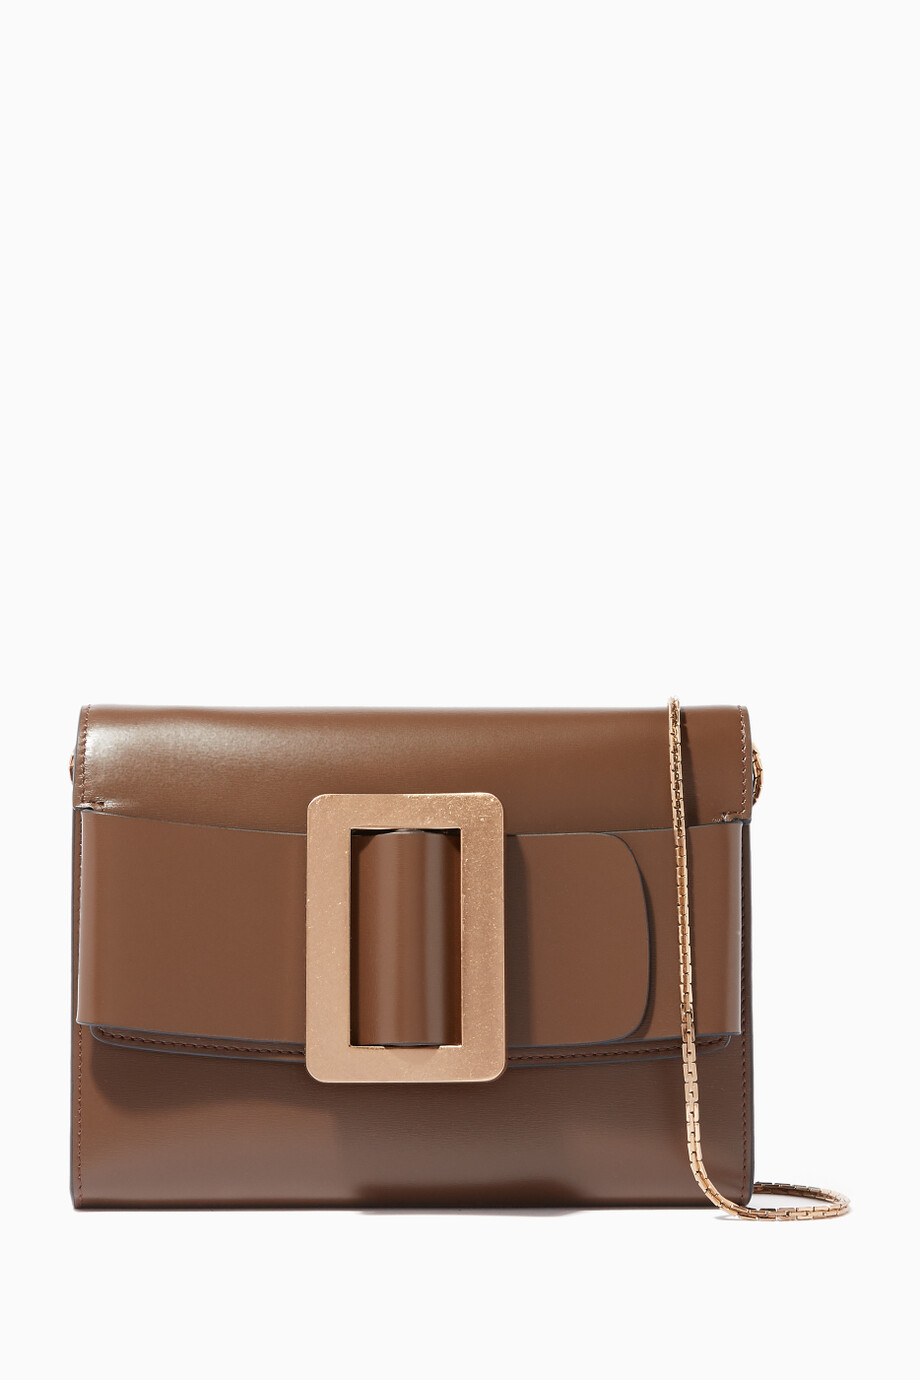 e07f43850 تسوق حقيبة كروس ترافل جلد بنية بوي بنى للنساء | اُناس السعودية